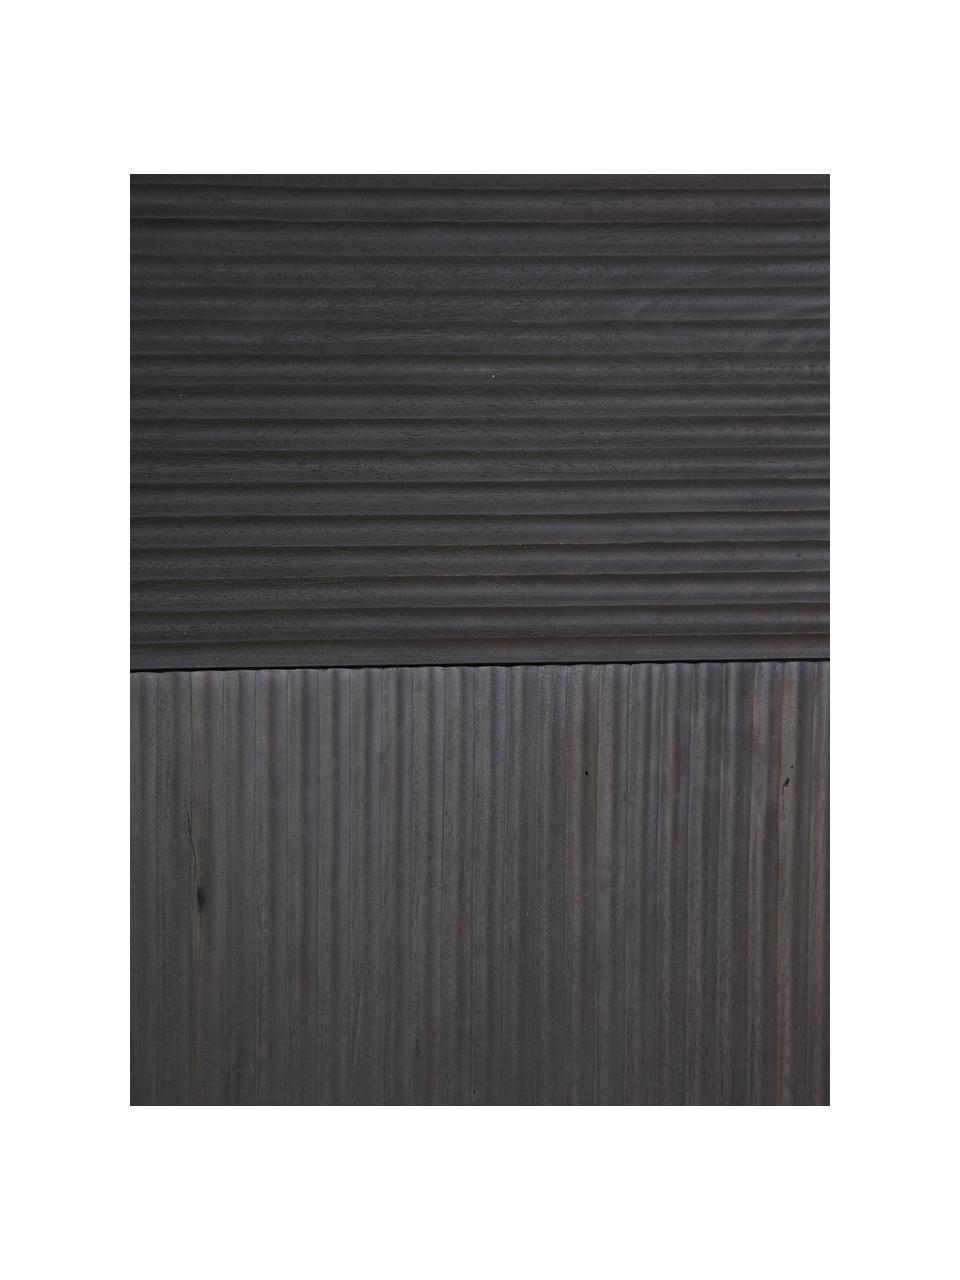 Acaciahouten dressoir Mamba met groeven decoratie, Frame: gelakt acaciahout, Poten: gelakt metaal, Zwart, 115 x 140 cm